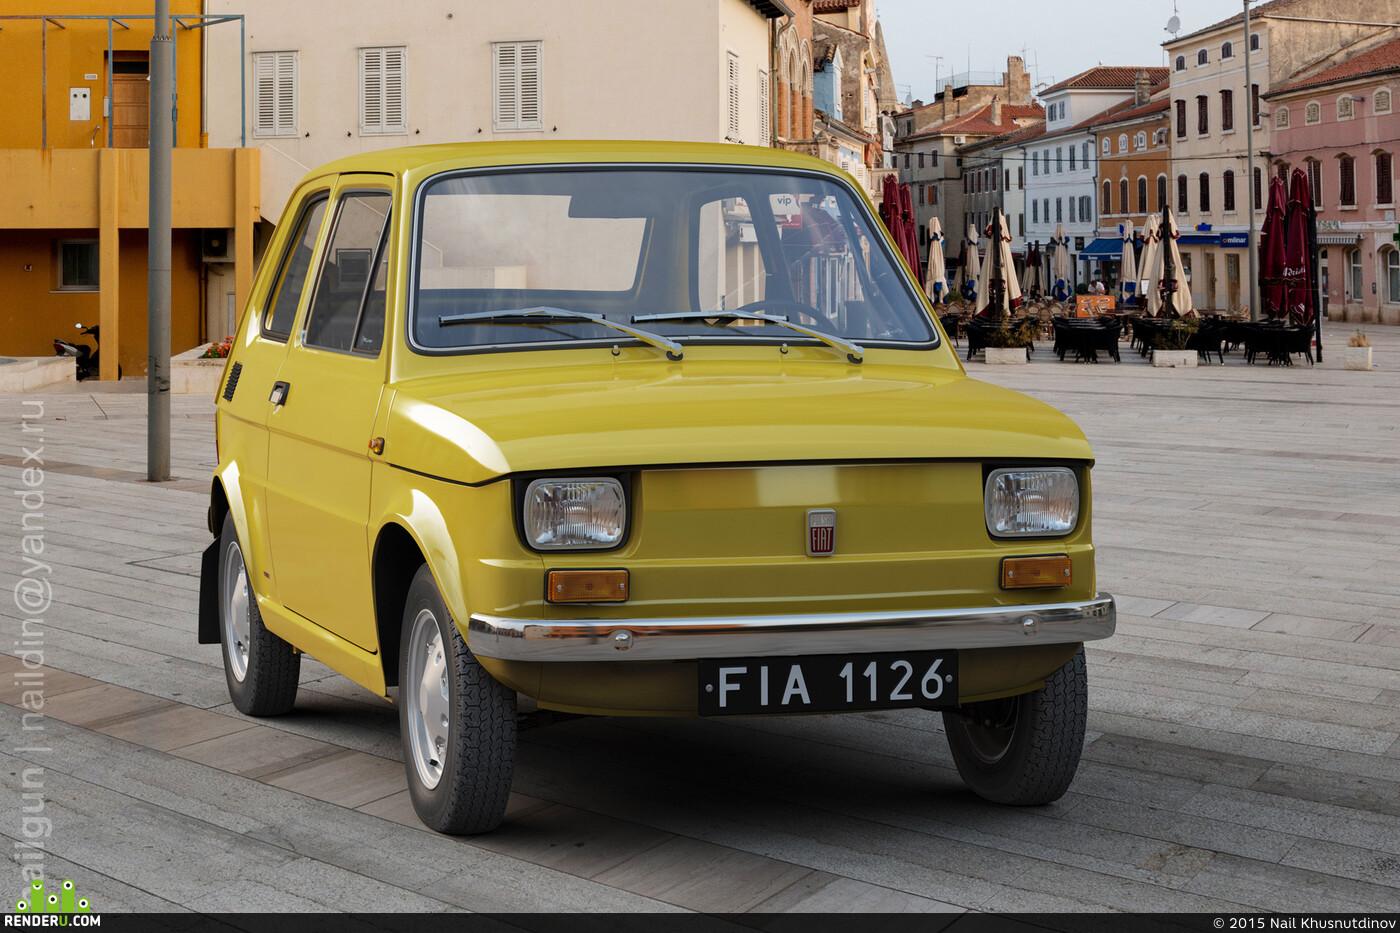 Poland, polsky, Polish, Malych, 126p, fiat, car, 2-door, retro, Car / motorcycle